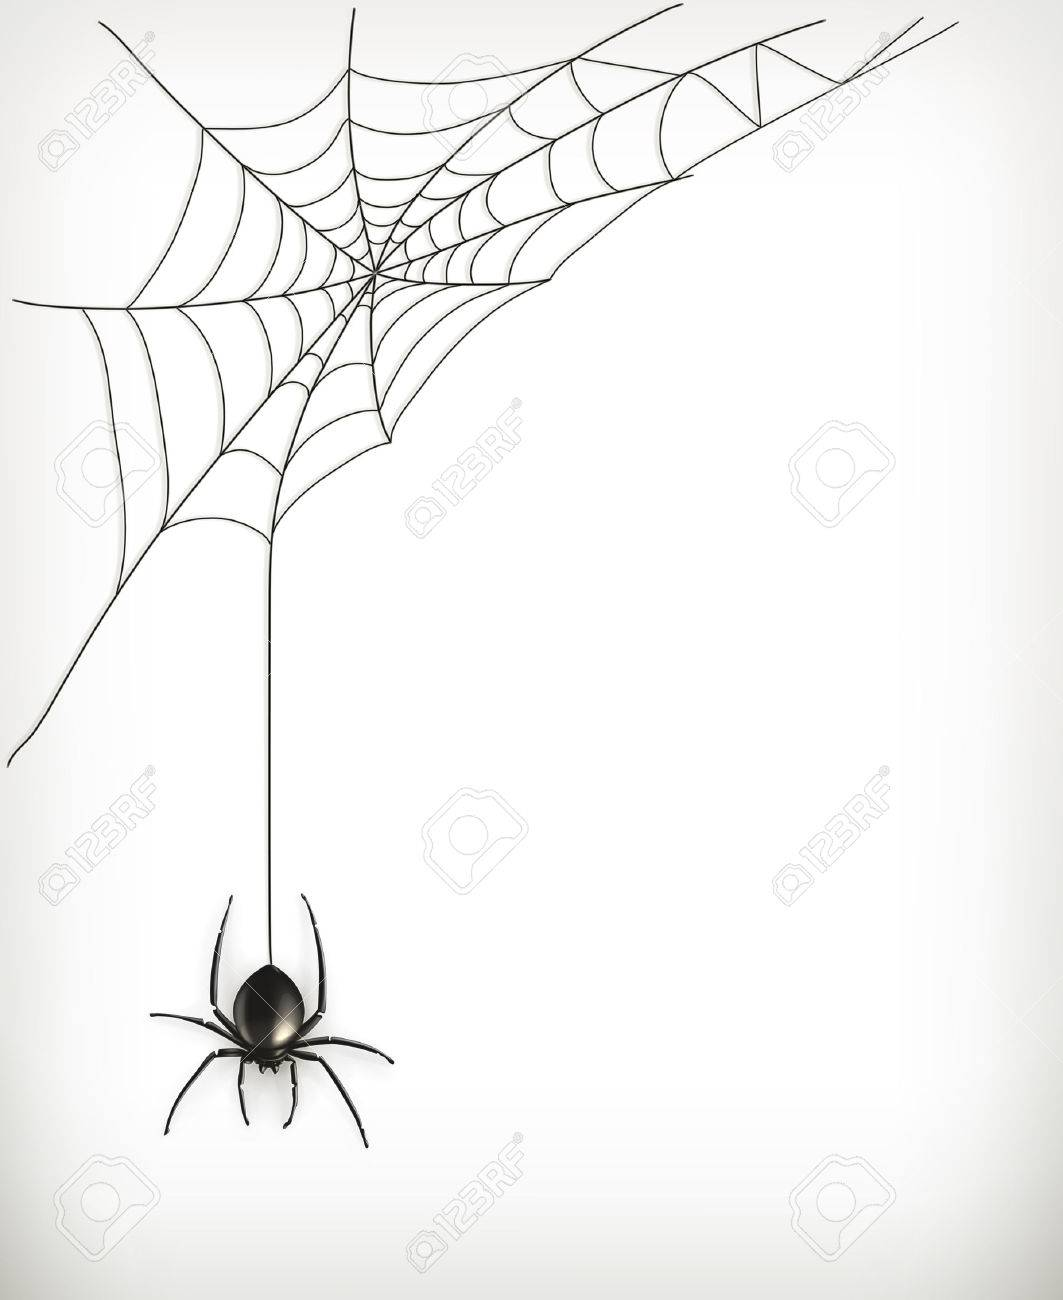 Spider web vector - 31975072